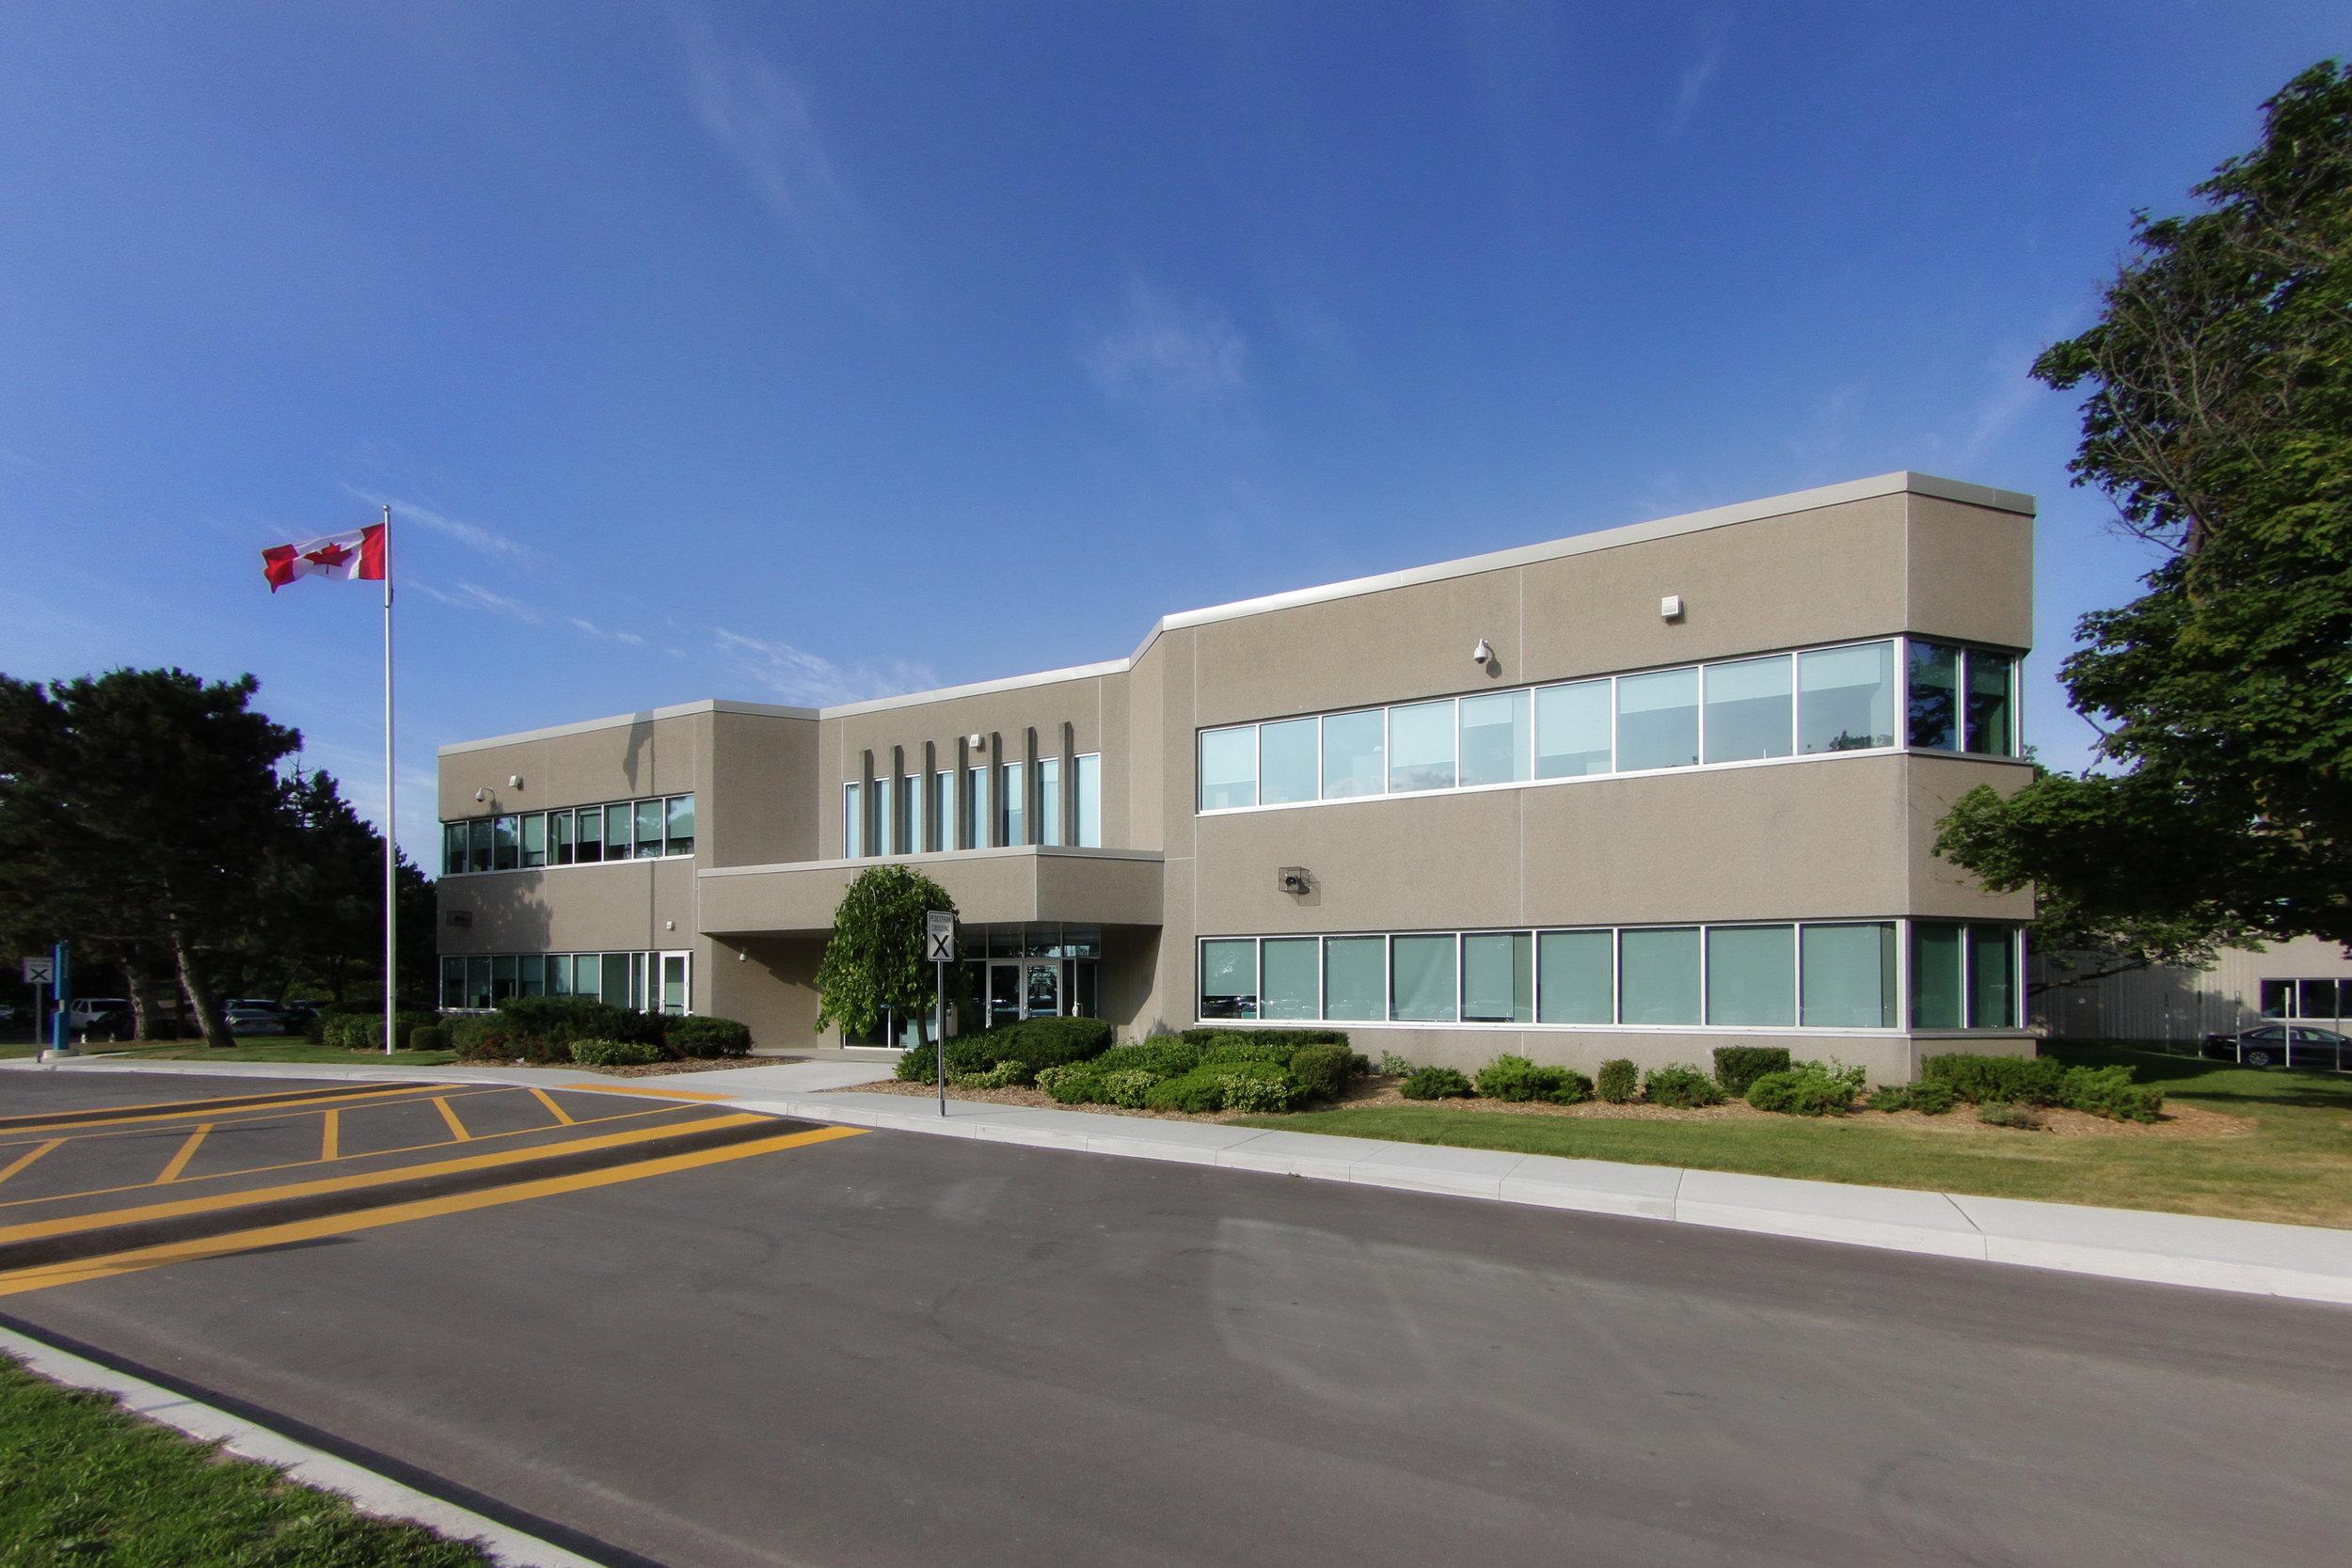 Toronto Hydro Operations Centre